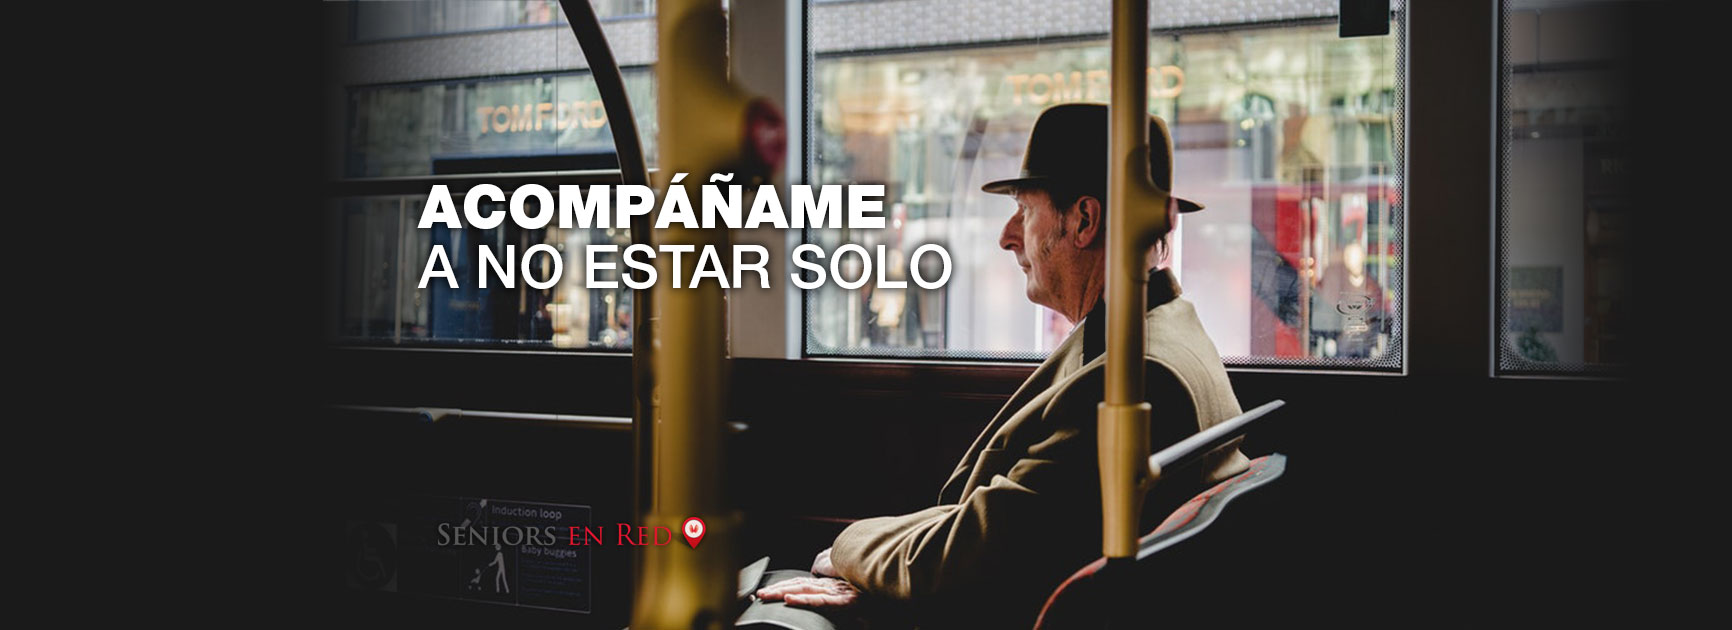 Slider_acompana